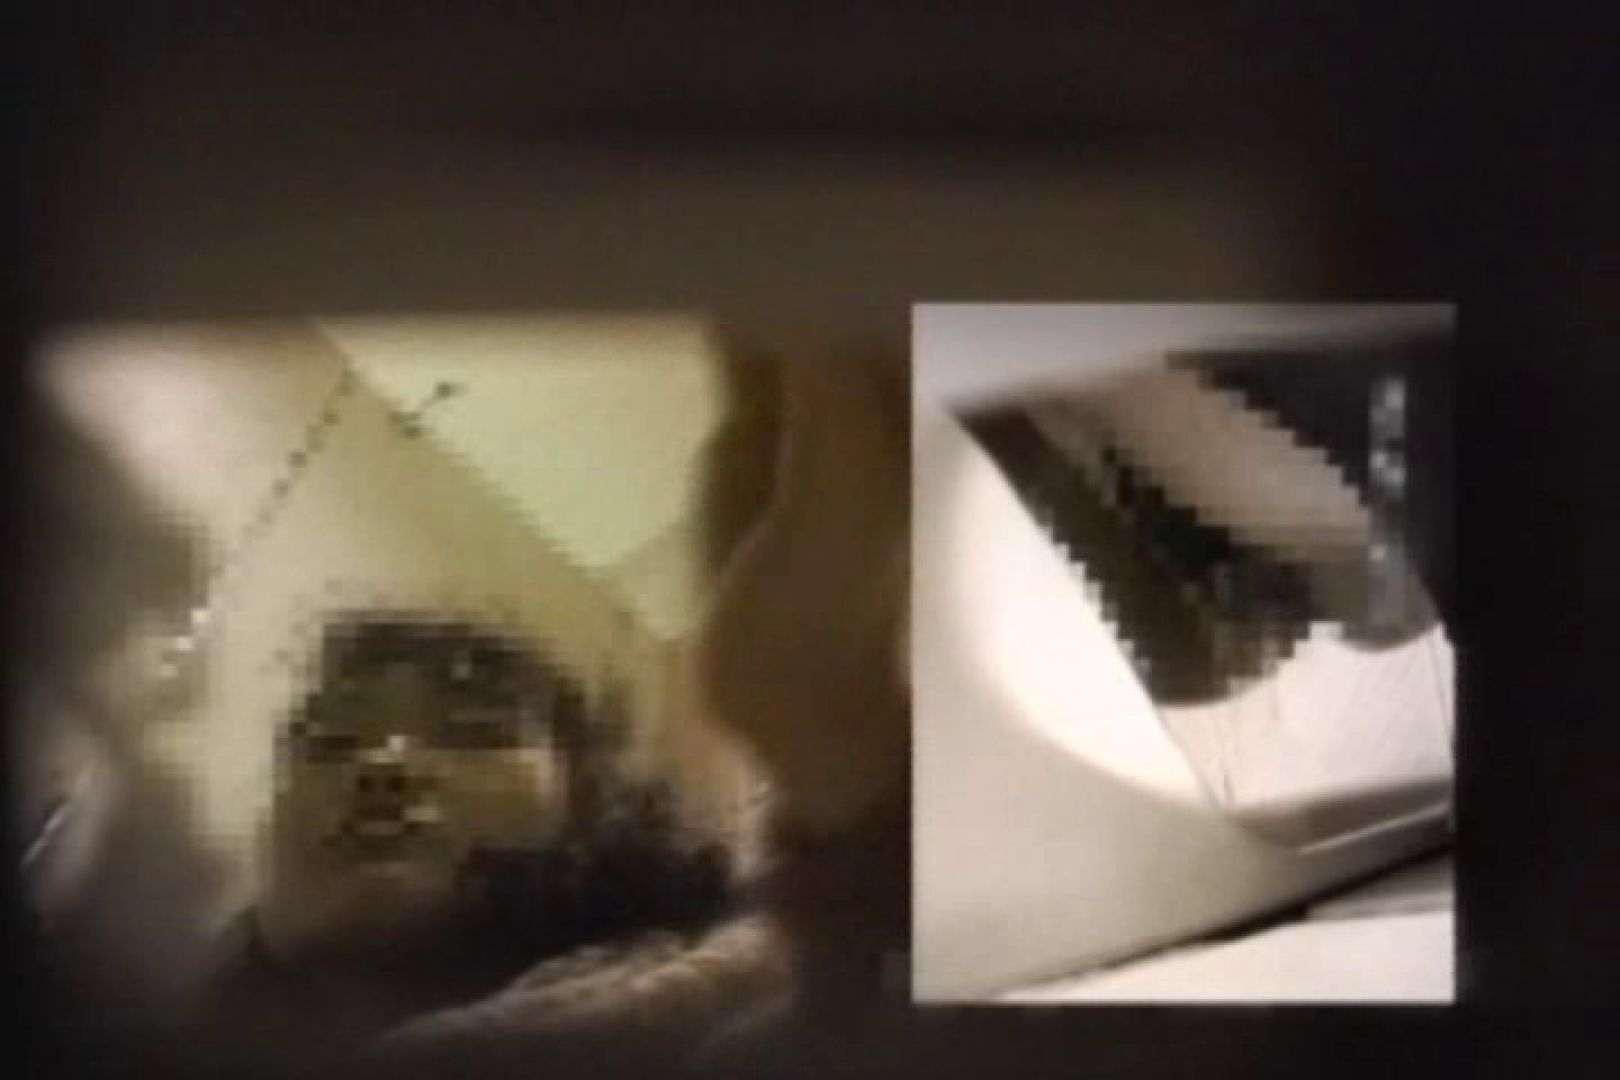 STY-013 実録!2カメde女子洗面所 洗面所 盗み撮り動画 113pic 32